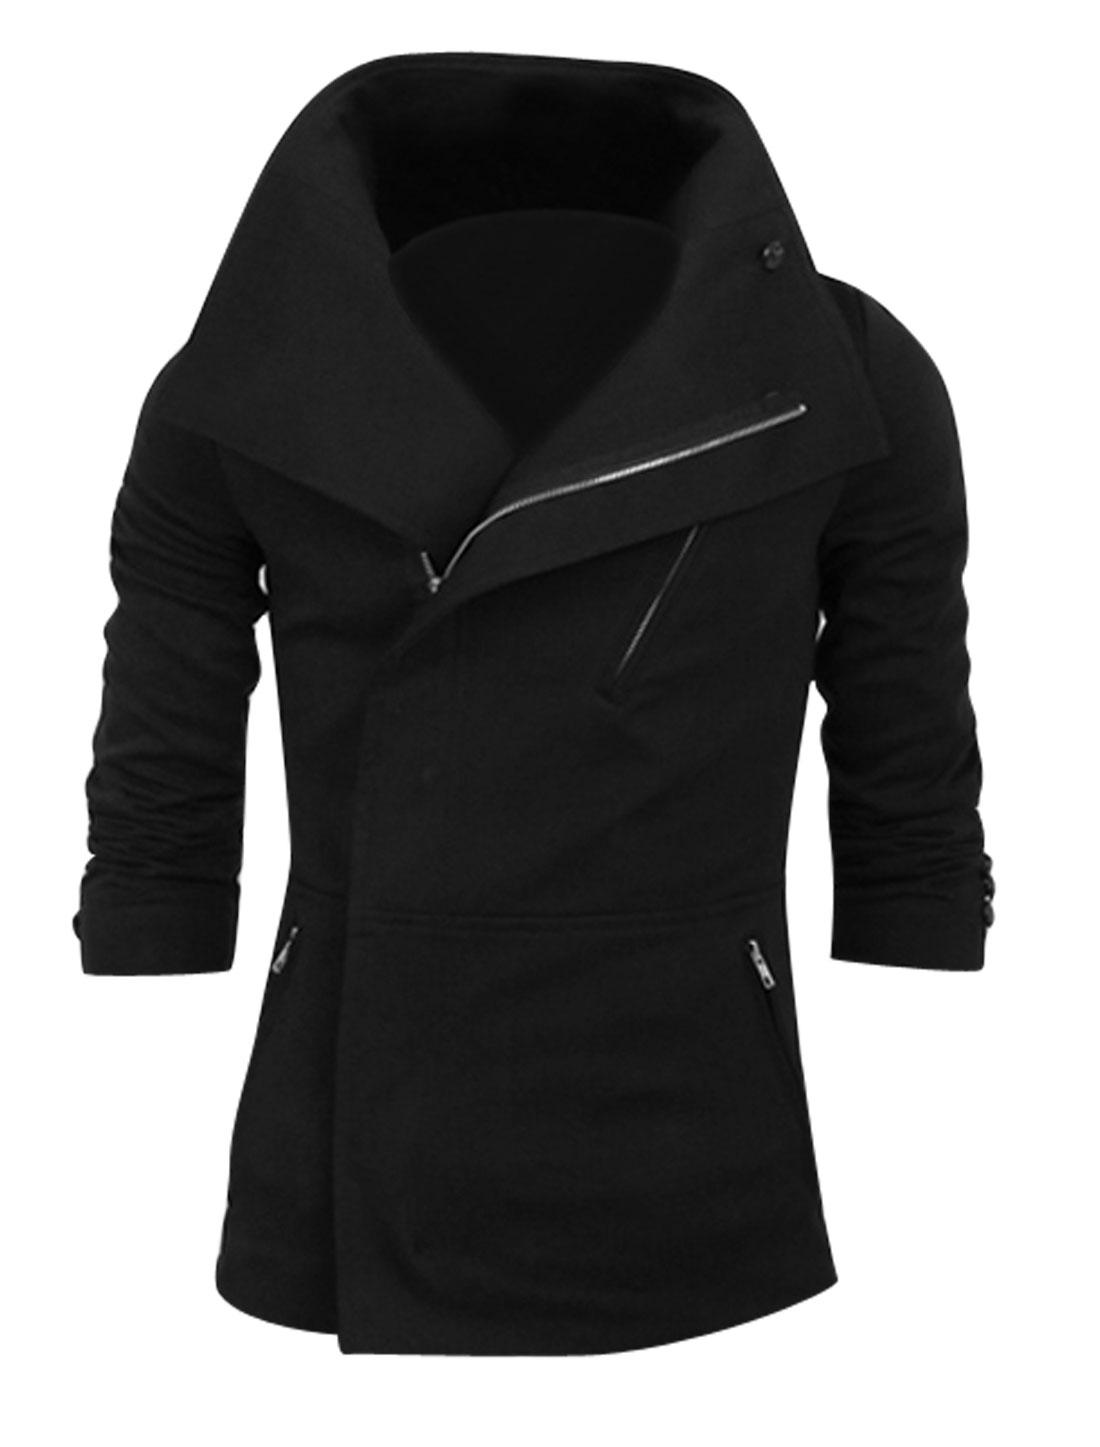 Convertible Collar Full Zip Casual Jacket for Men Black M